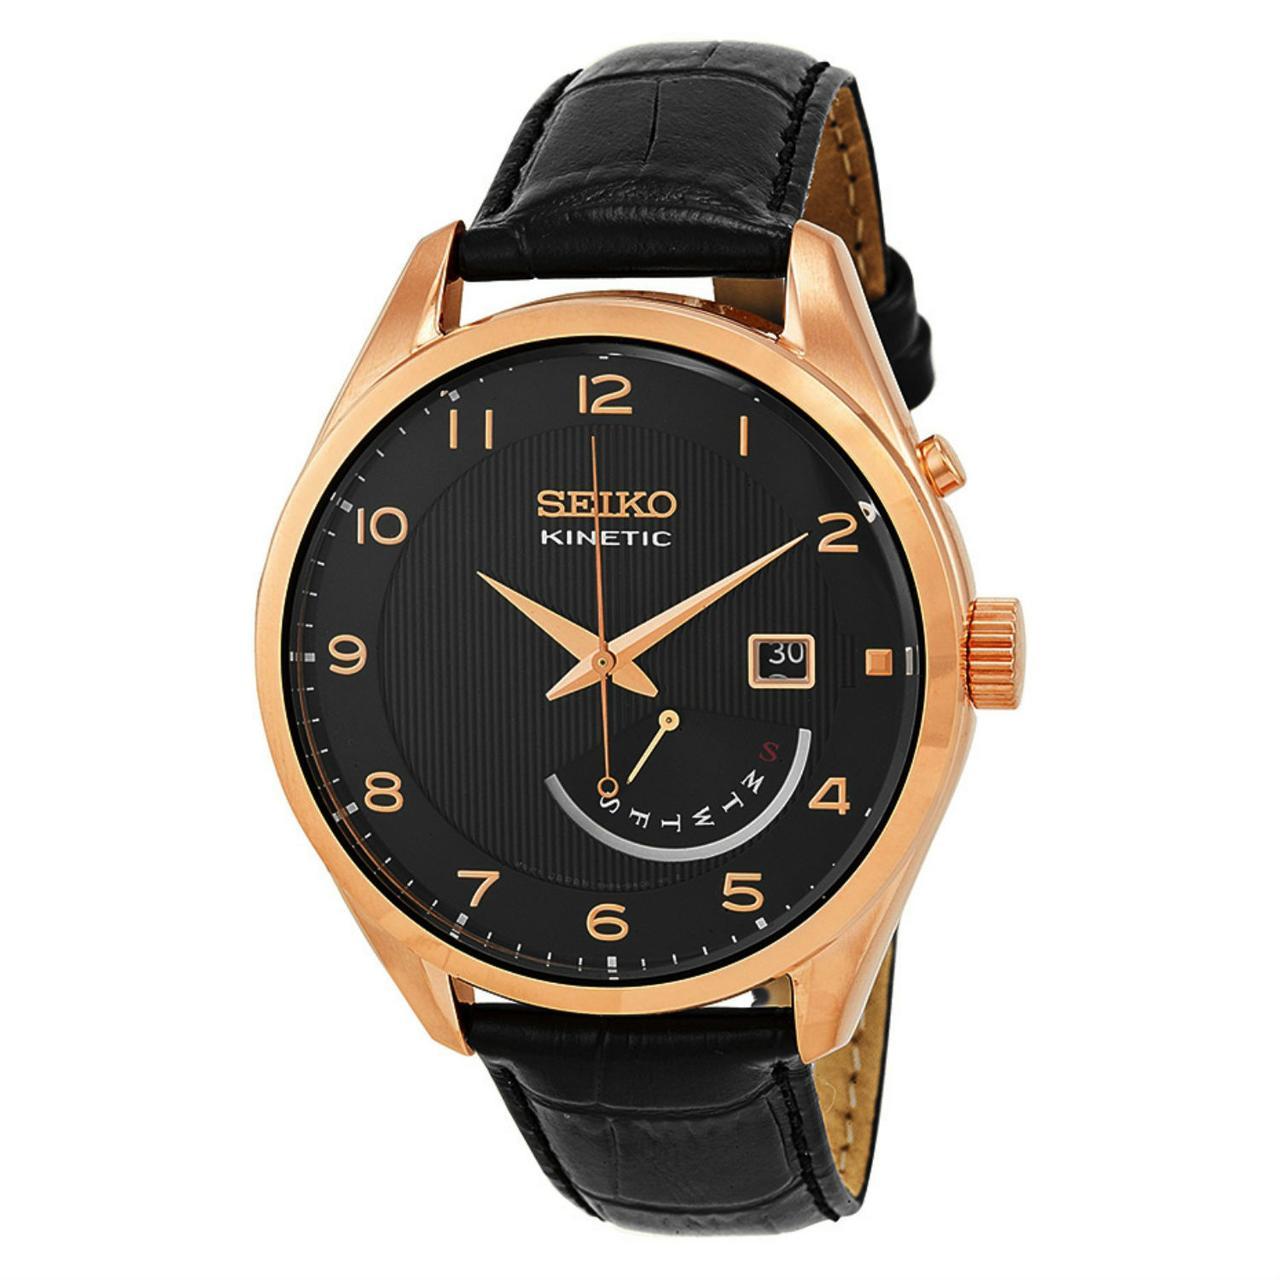 Часы Seiko SRN054P1 Kinetic